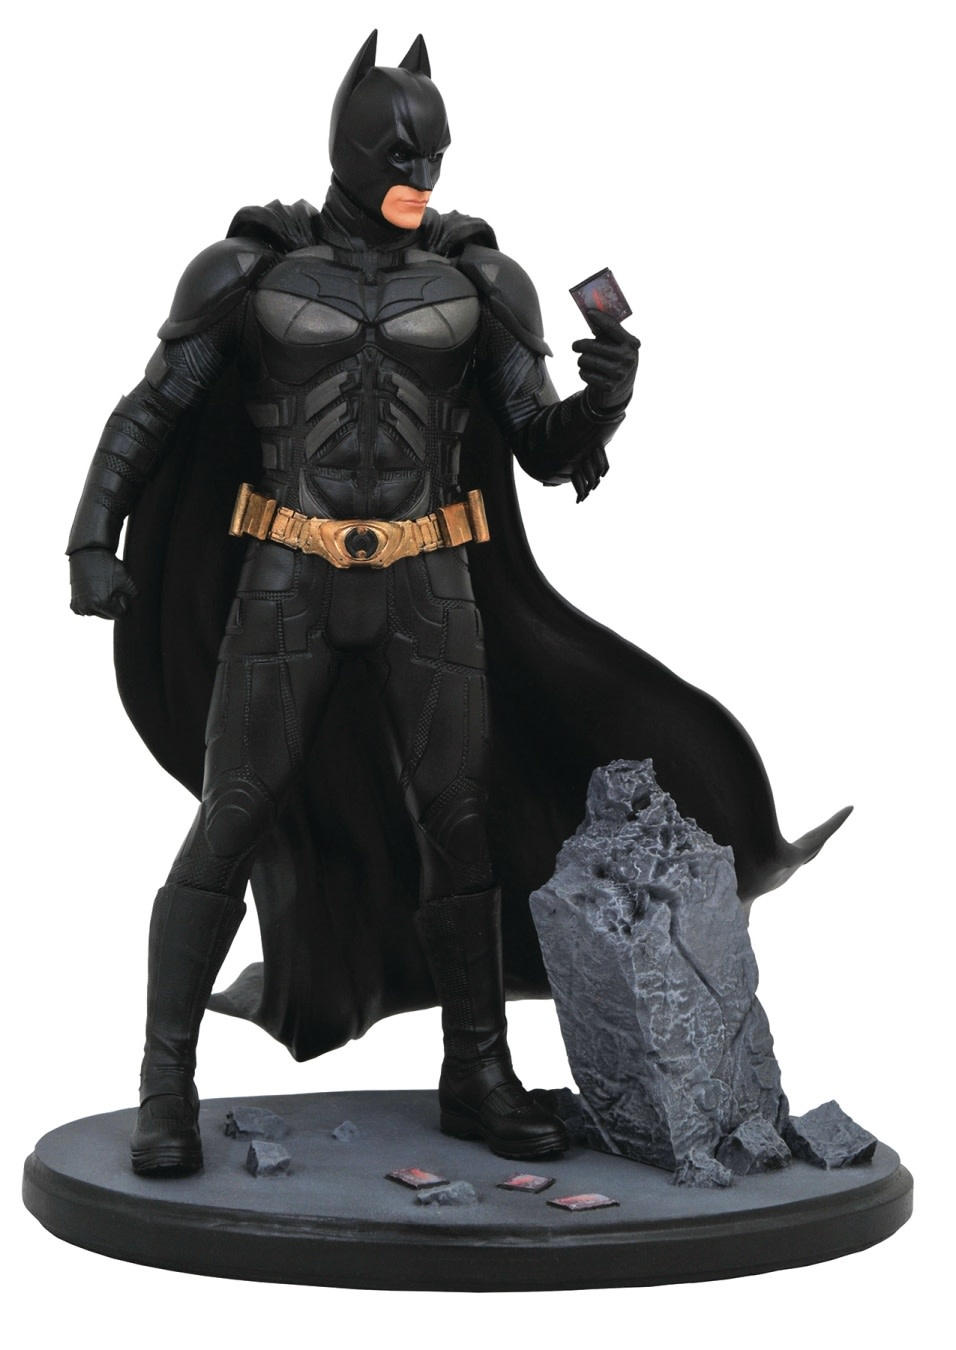 Diamond Direct DC Comics Gallery: Batman Dark Knight Movie PVC Figure